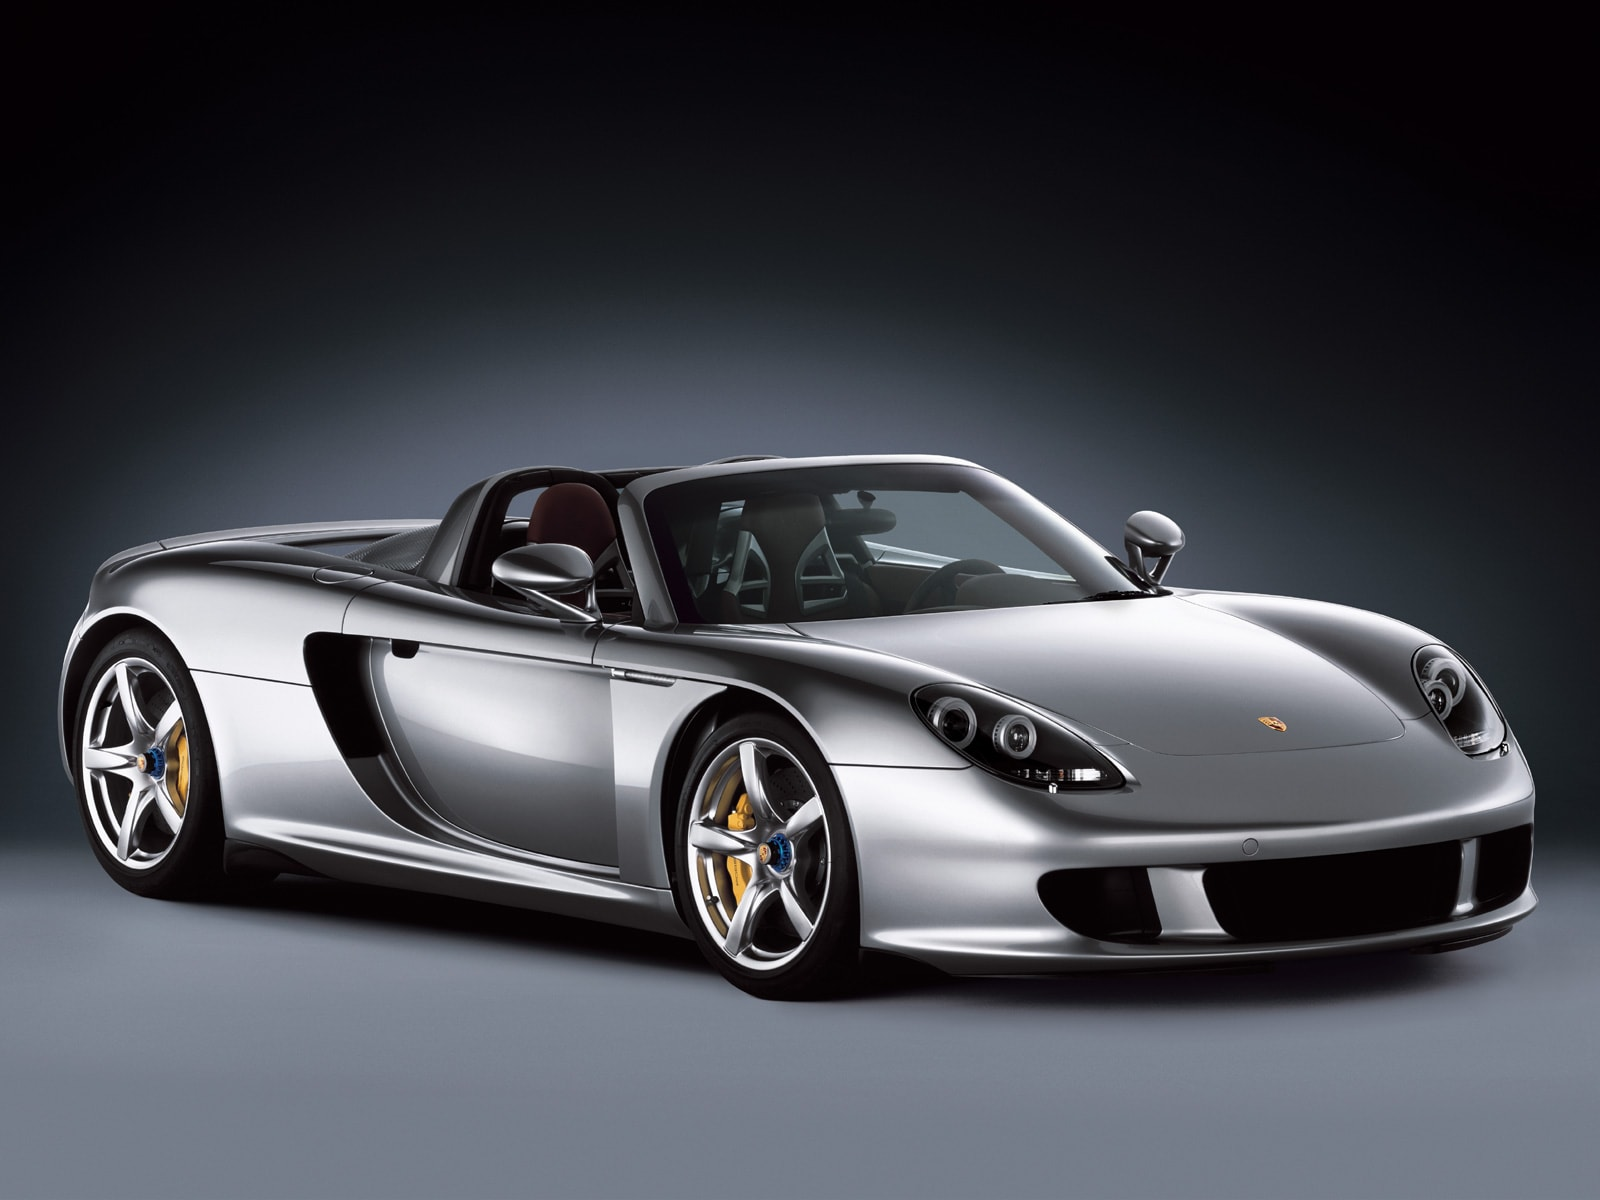 Porsche Carrera GT Free